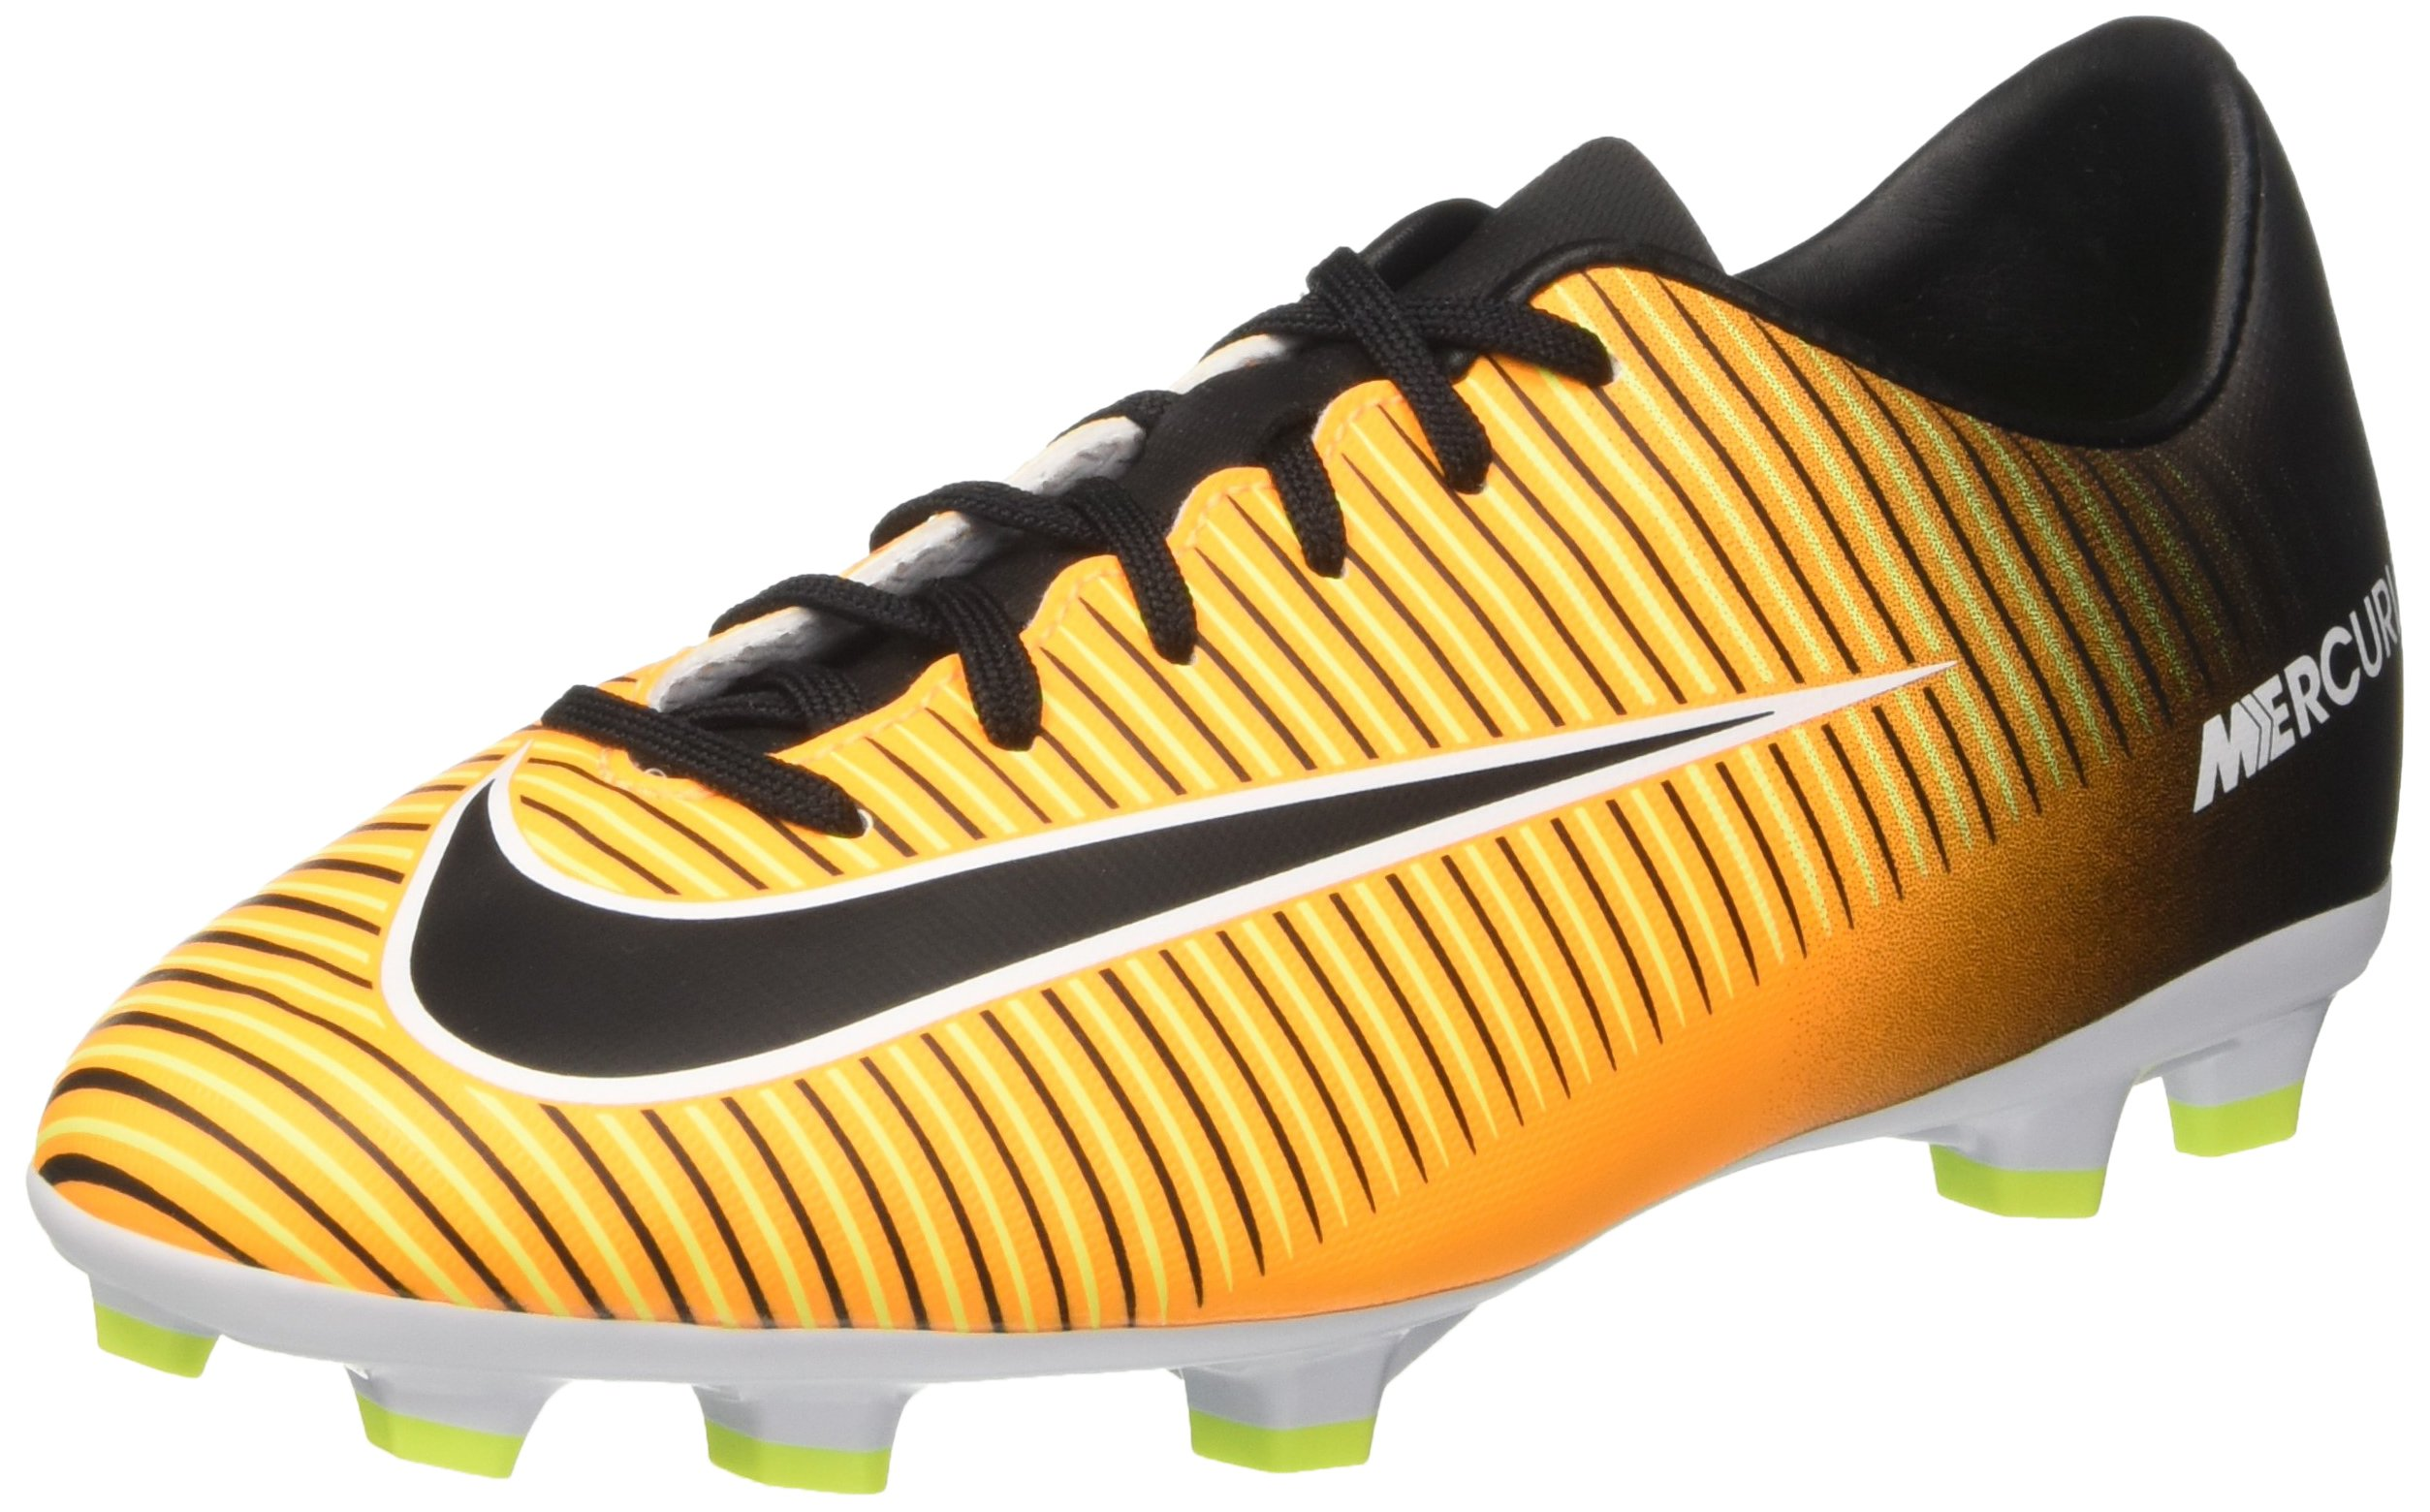 Nike Unisex JR Mercurial Victory VI FG, Laser Orange/Black-White-Volt, 2Y